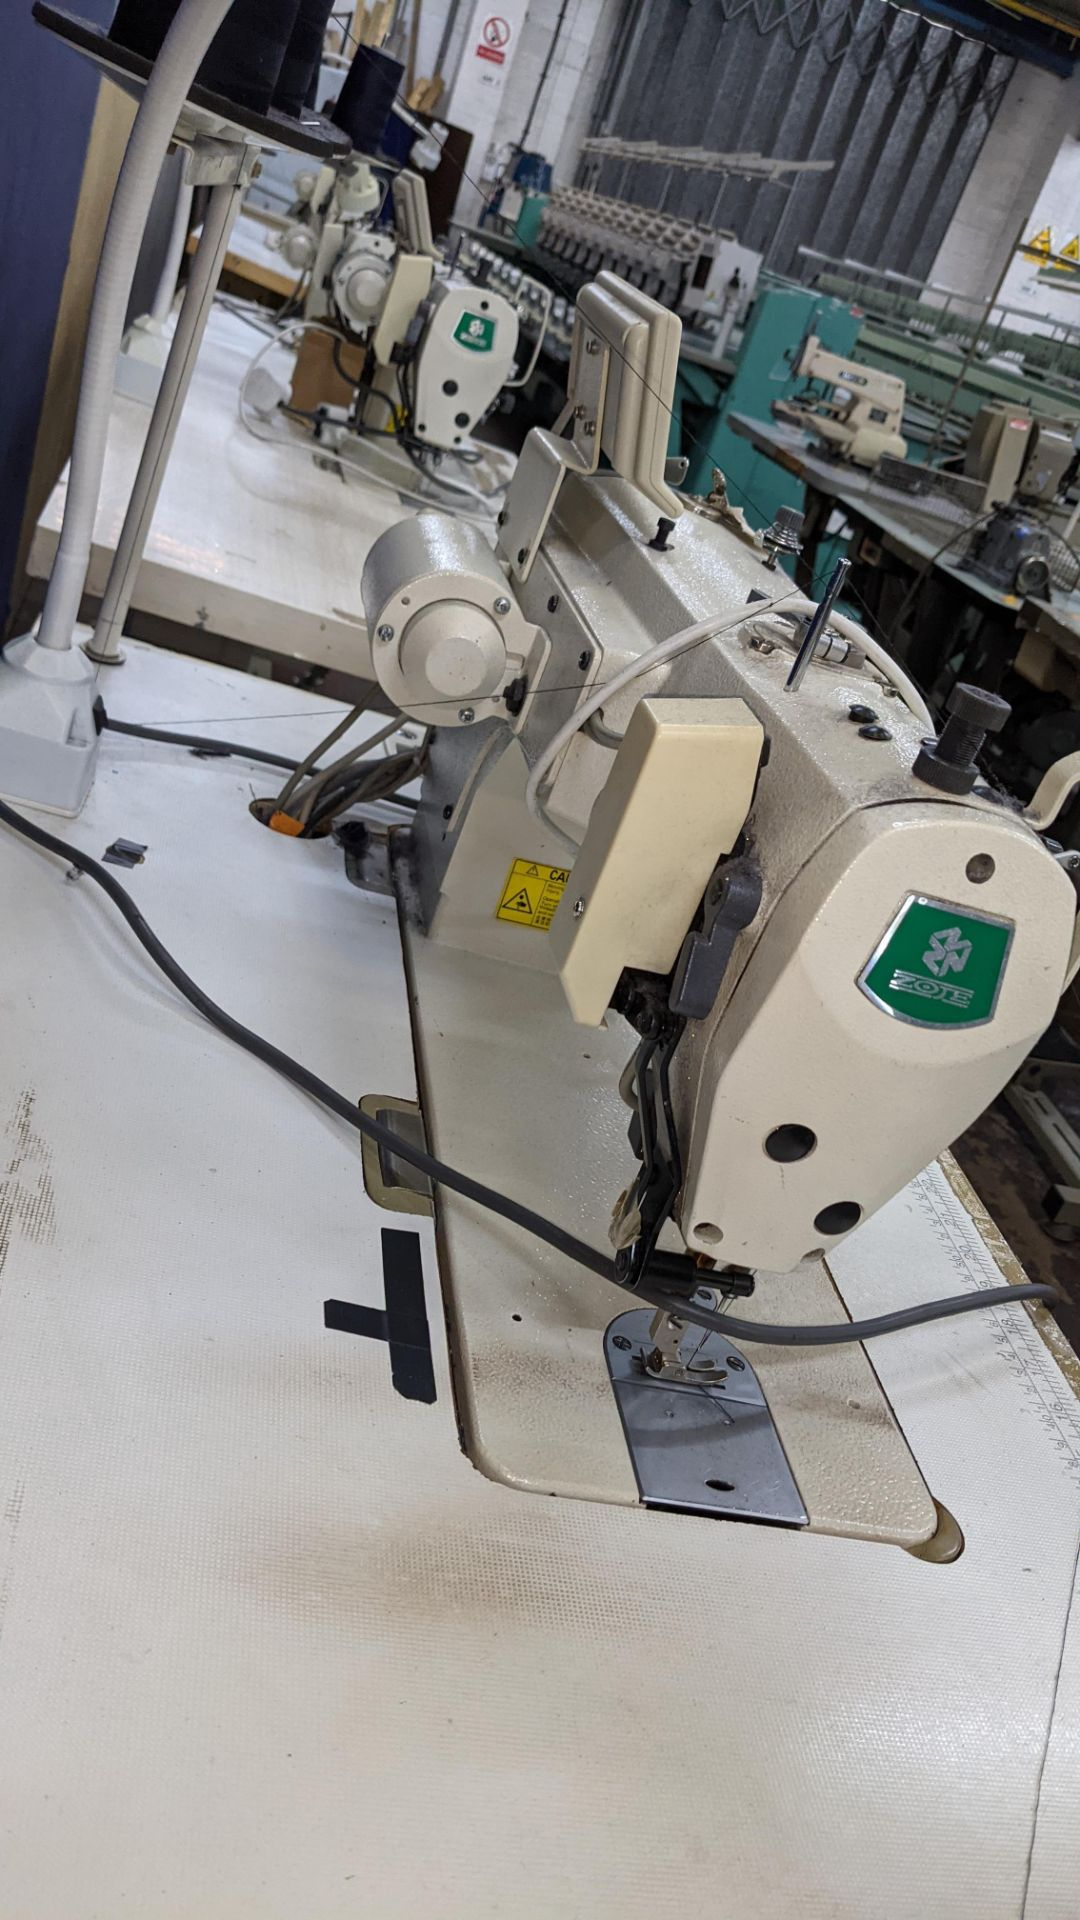 Zoje model ZJ9800A-D3B/PF lockstitch sewing machine with model WR-501 digital controller - Image 11 of 20